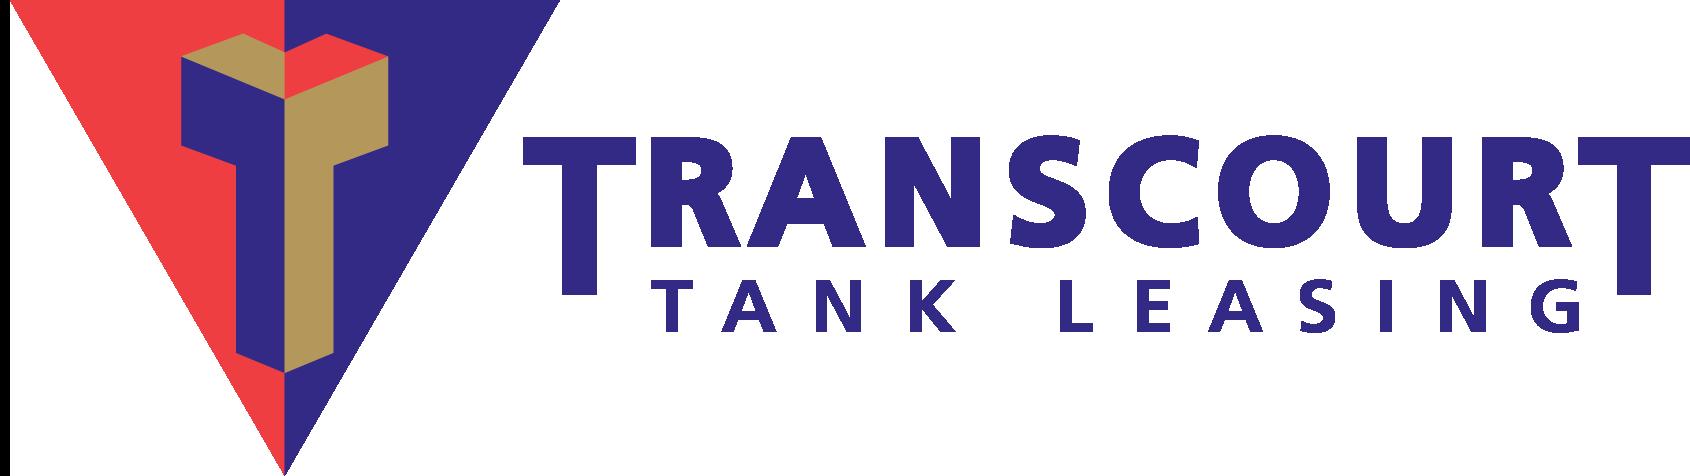 Transcourt Tank Leasing